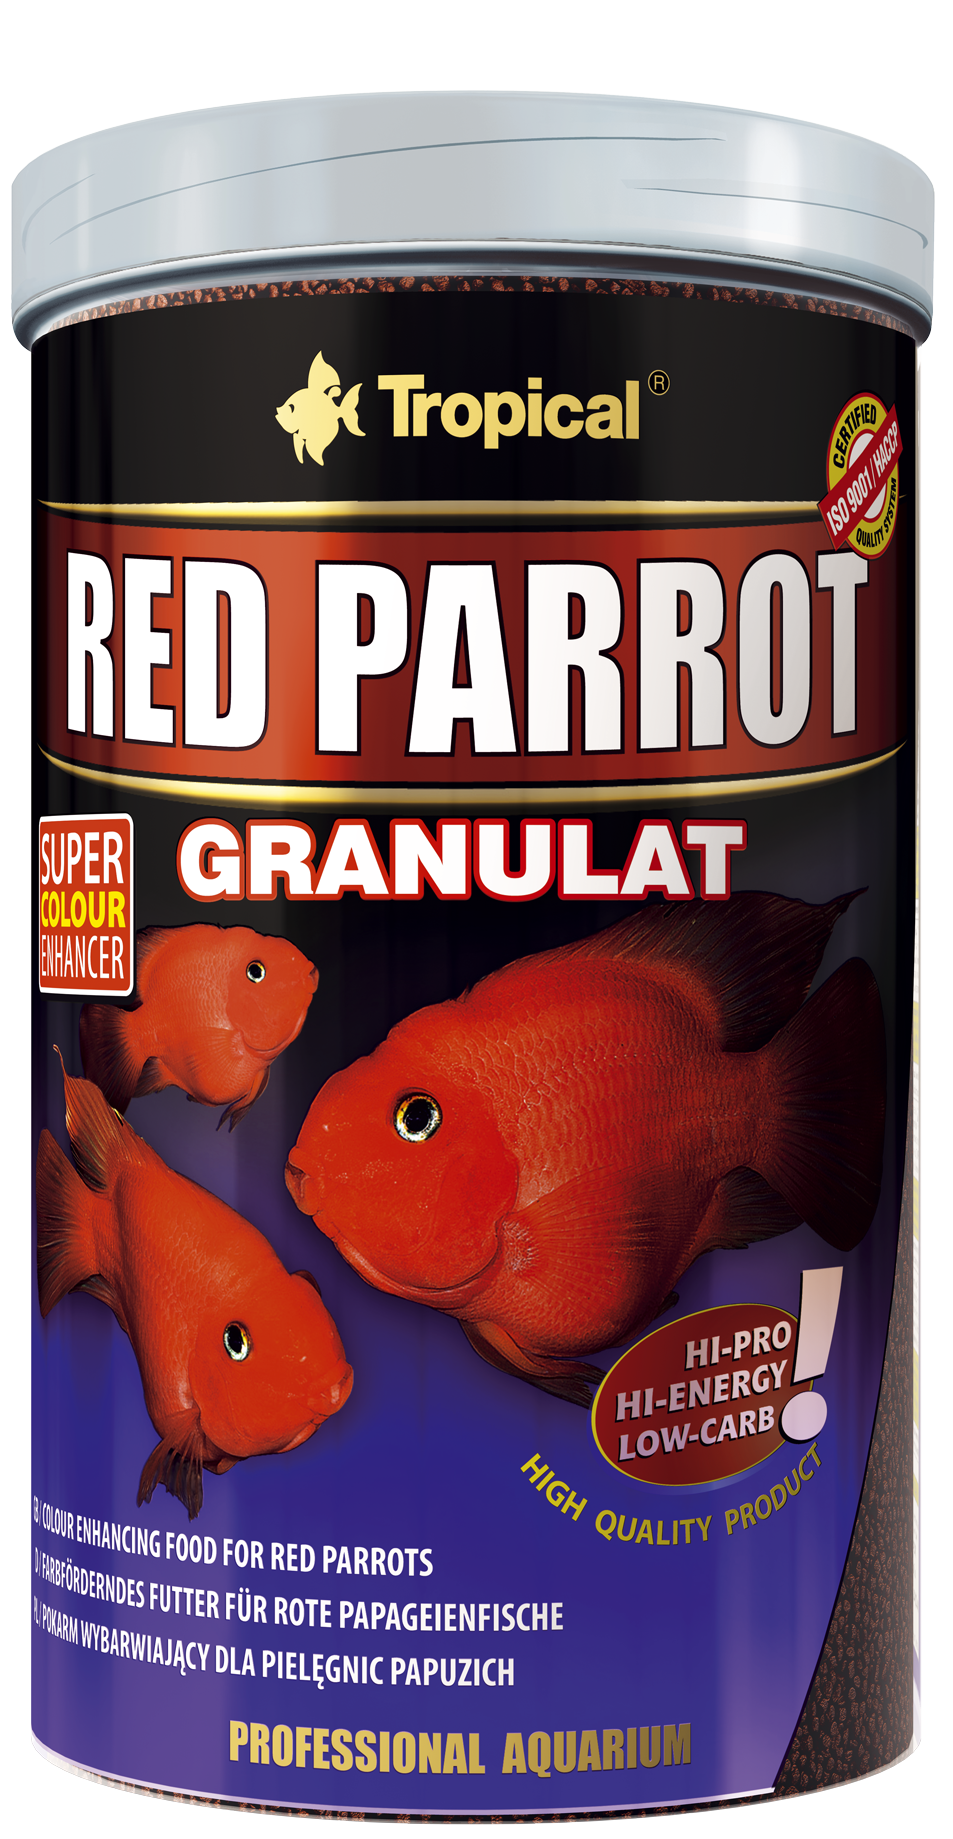 red-parrot-granulat_1000